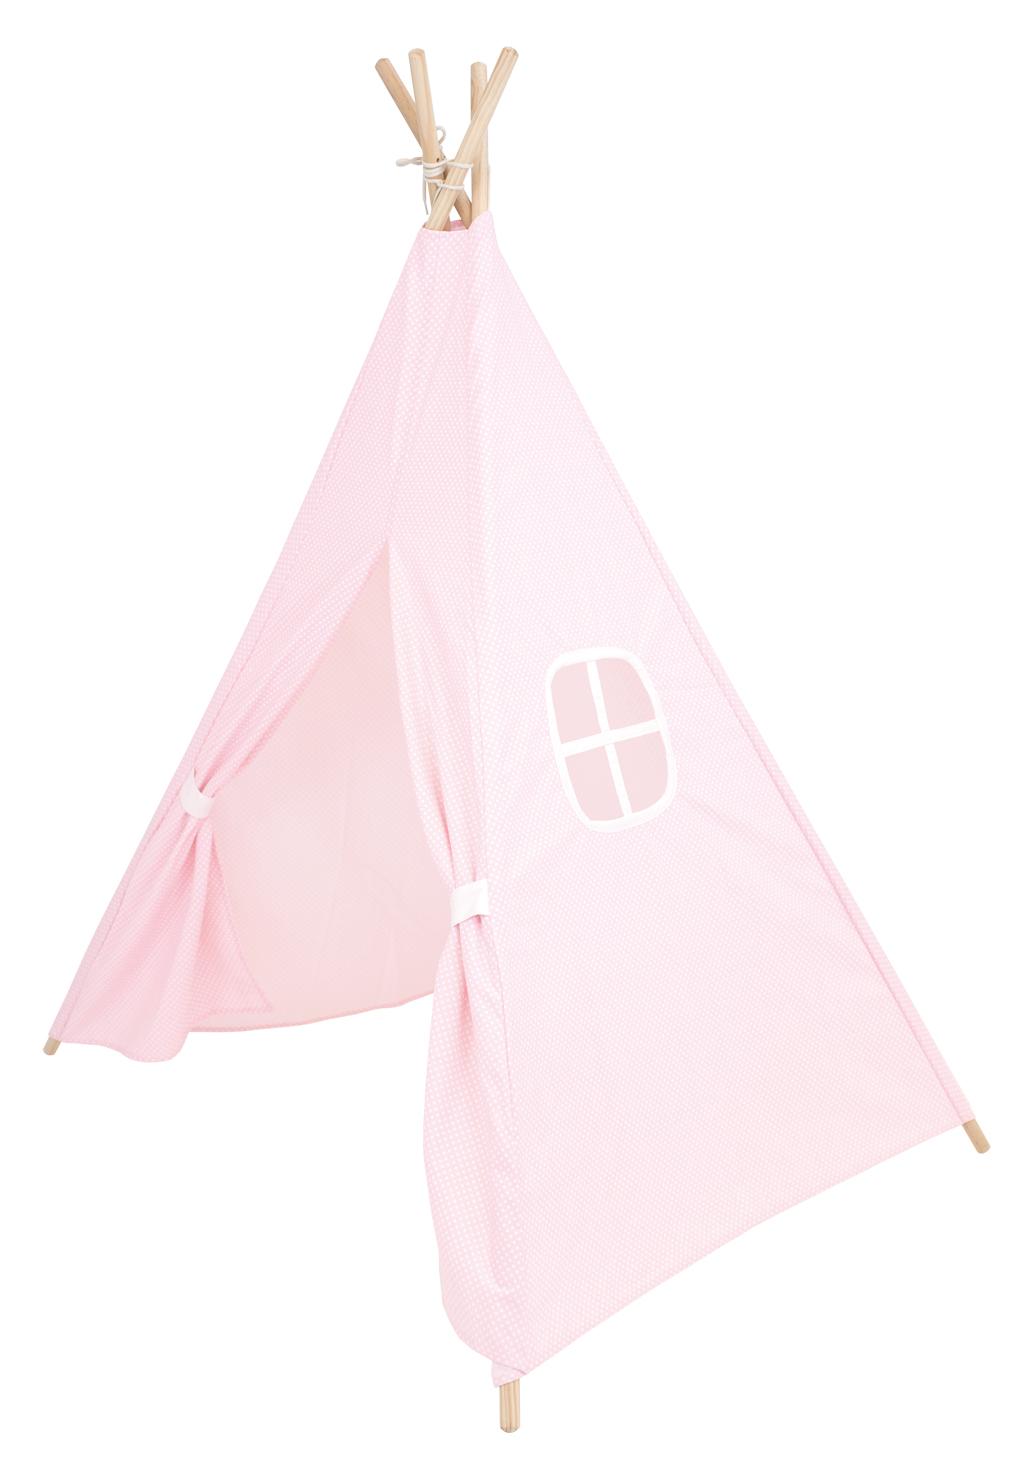 Spielzelt Tipi Zelt aus Stoff rosa